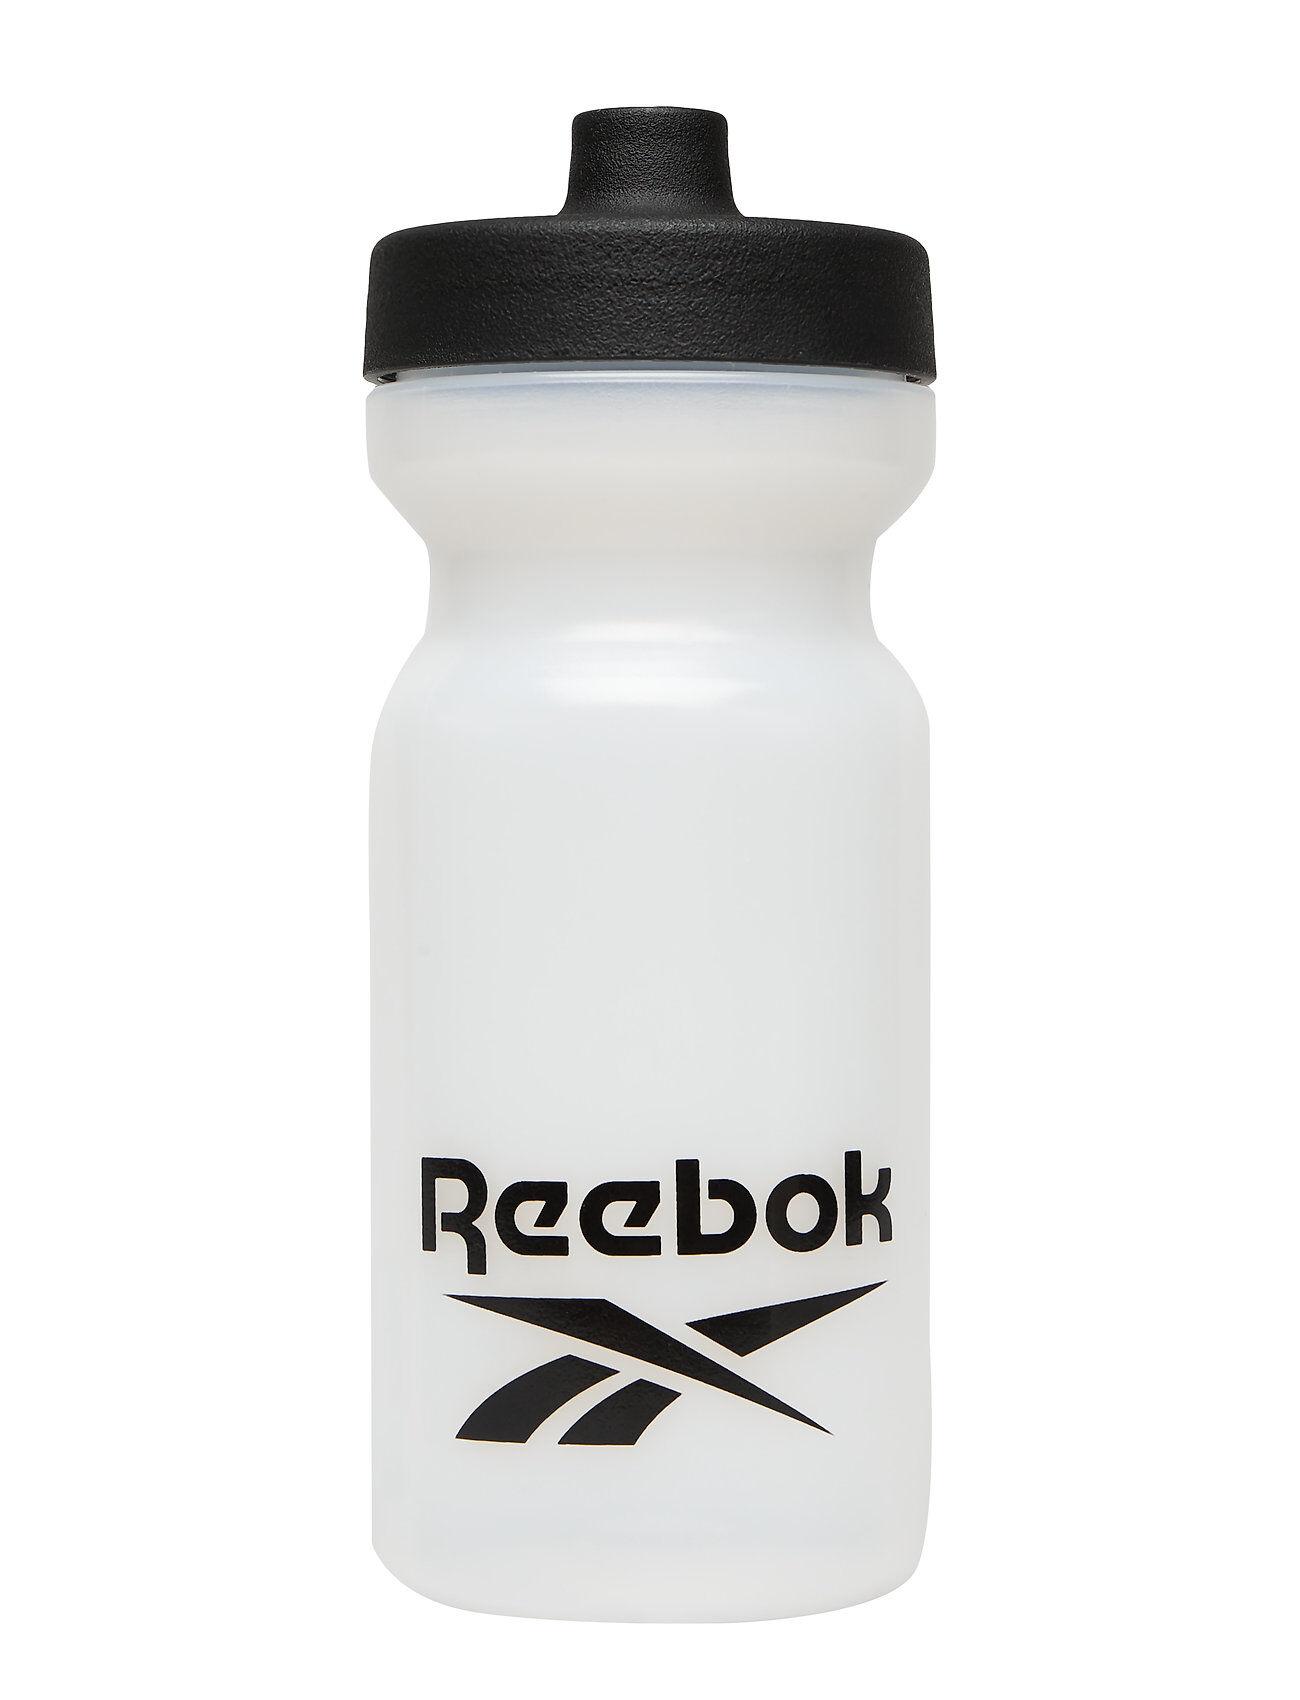 Reebok Performance Te Bottle 500 Accessories Water Bottles Valkoinen Reebok Performance